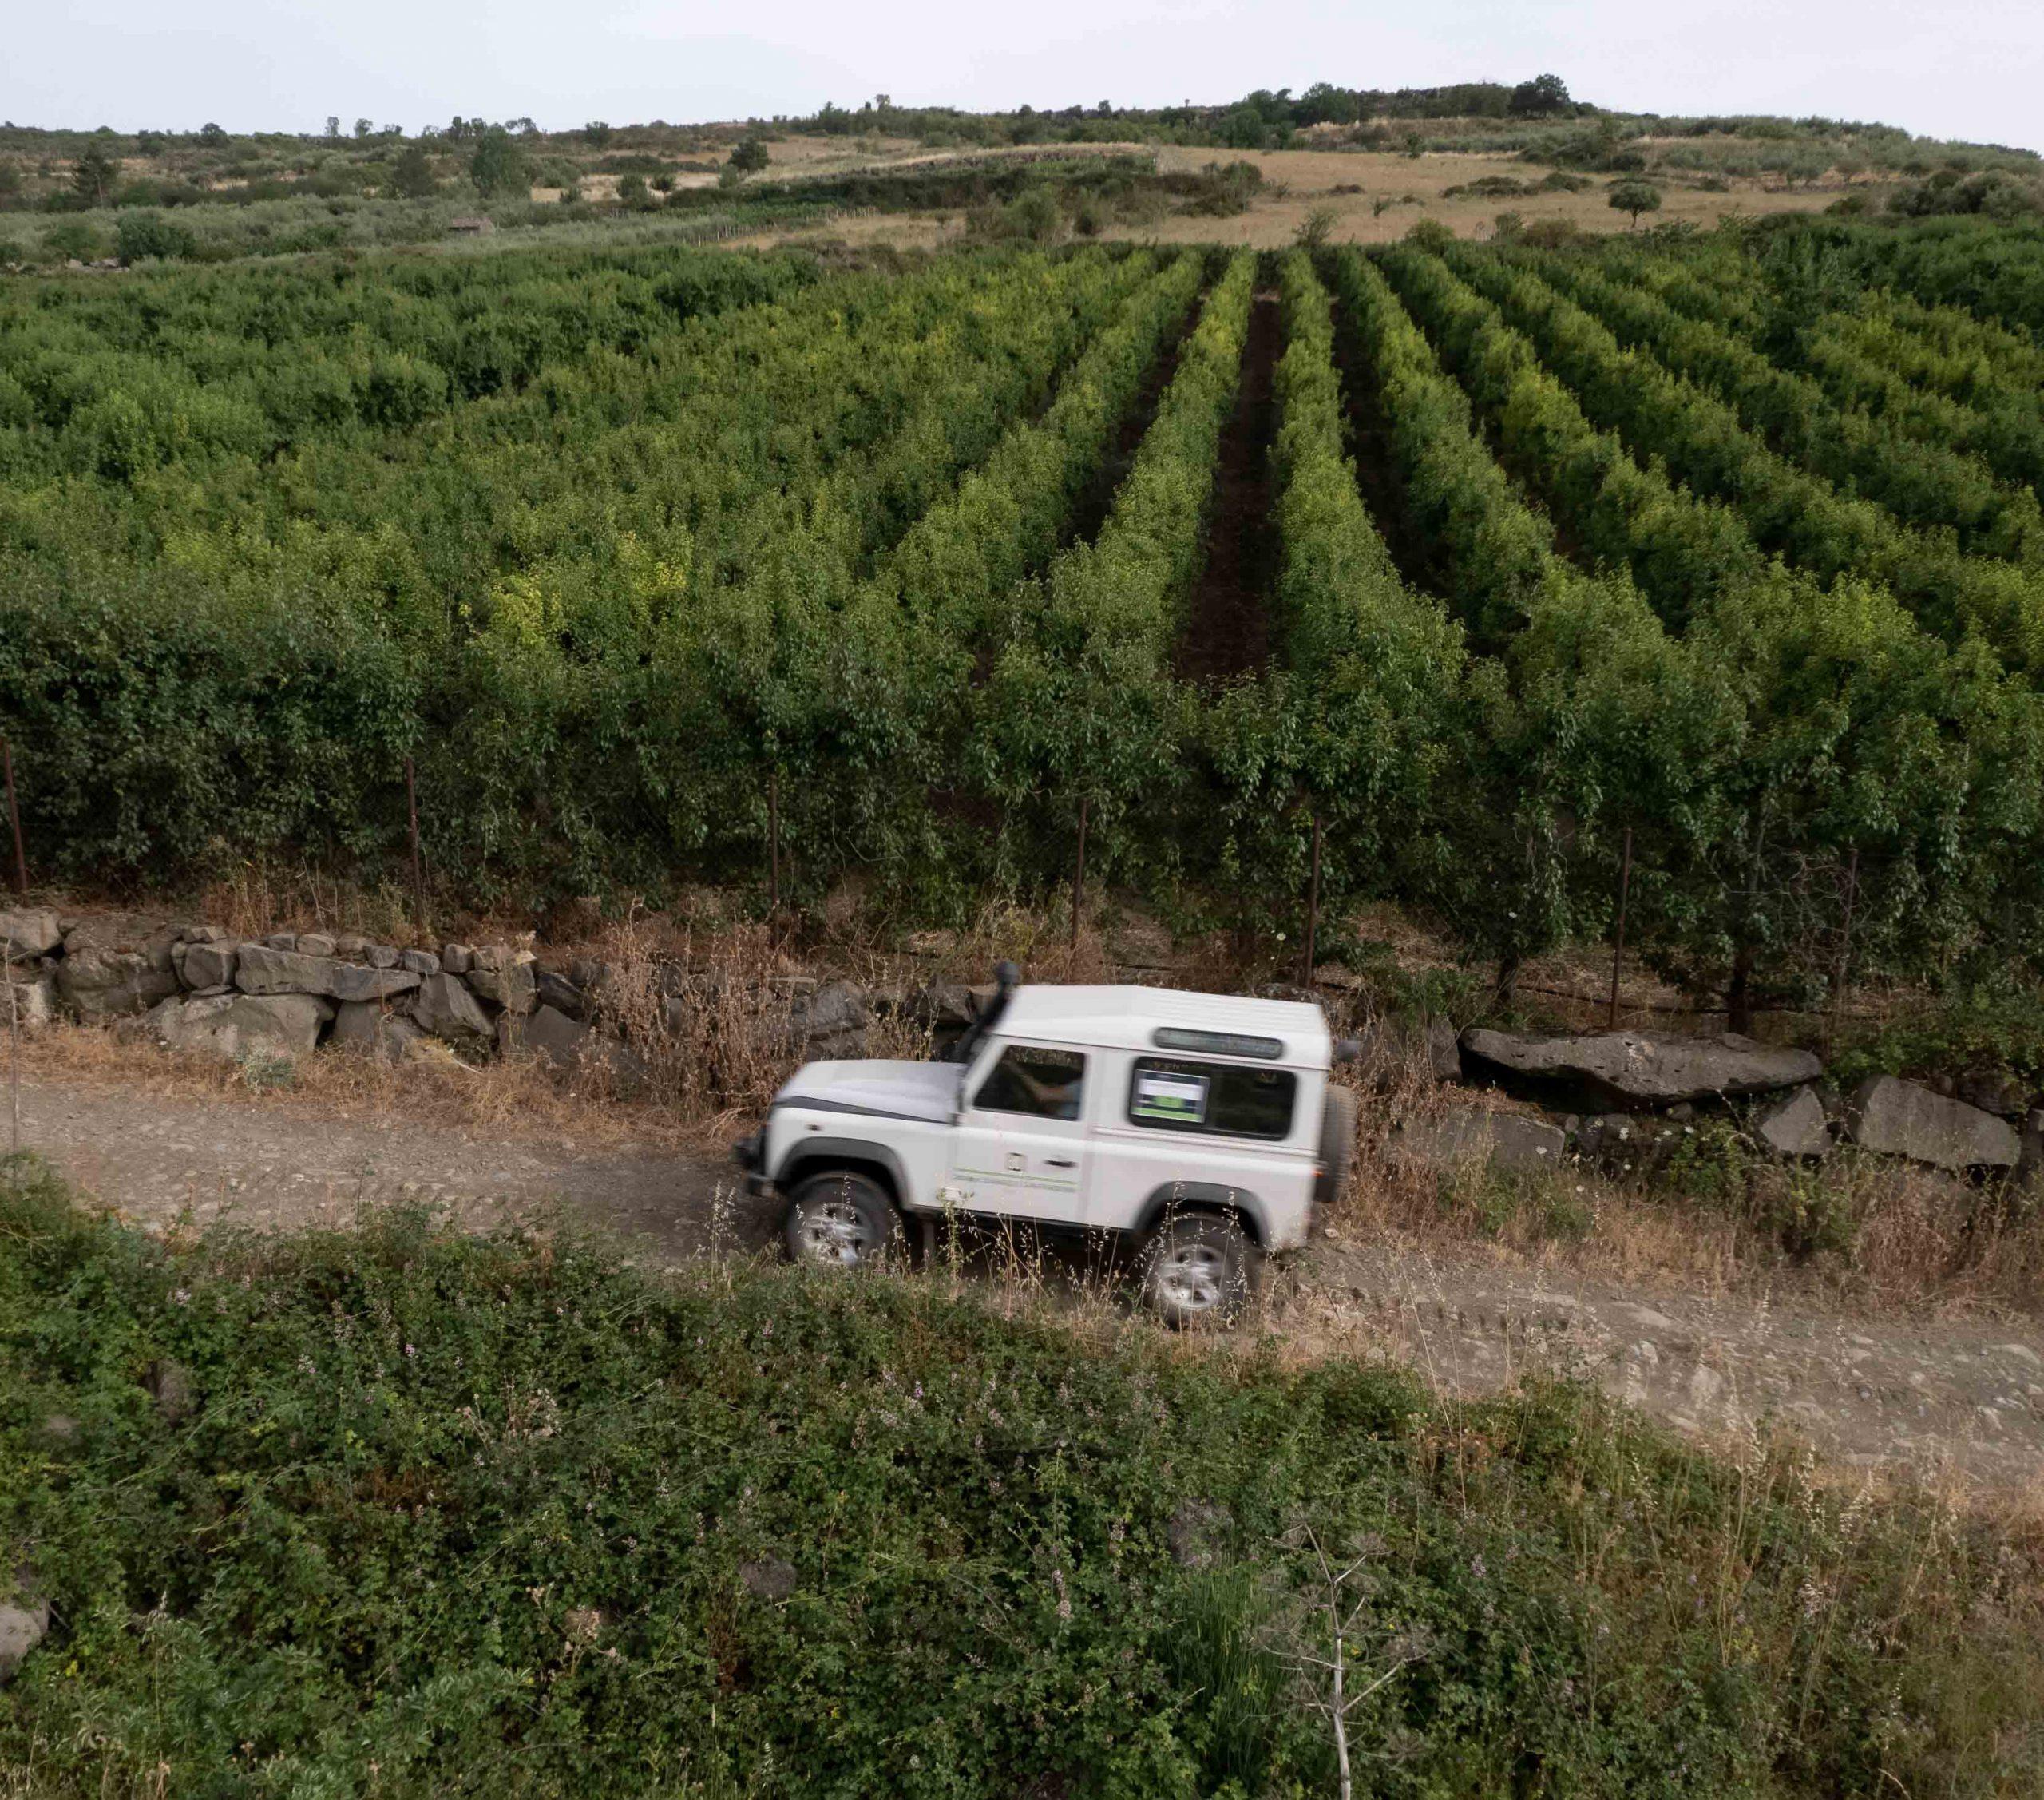 Land_Rover_Tour_Sicilia_2021_Land_Rover_Experience_Italia_-93